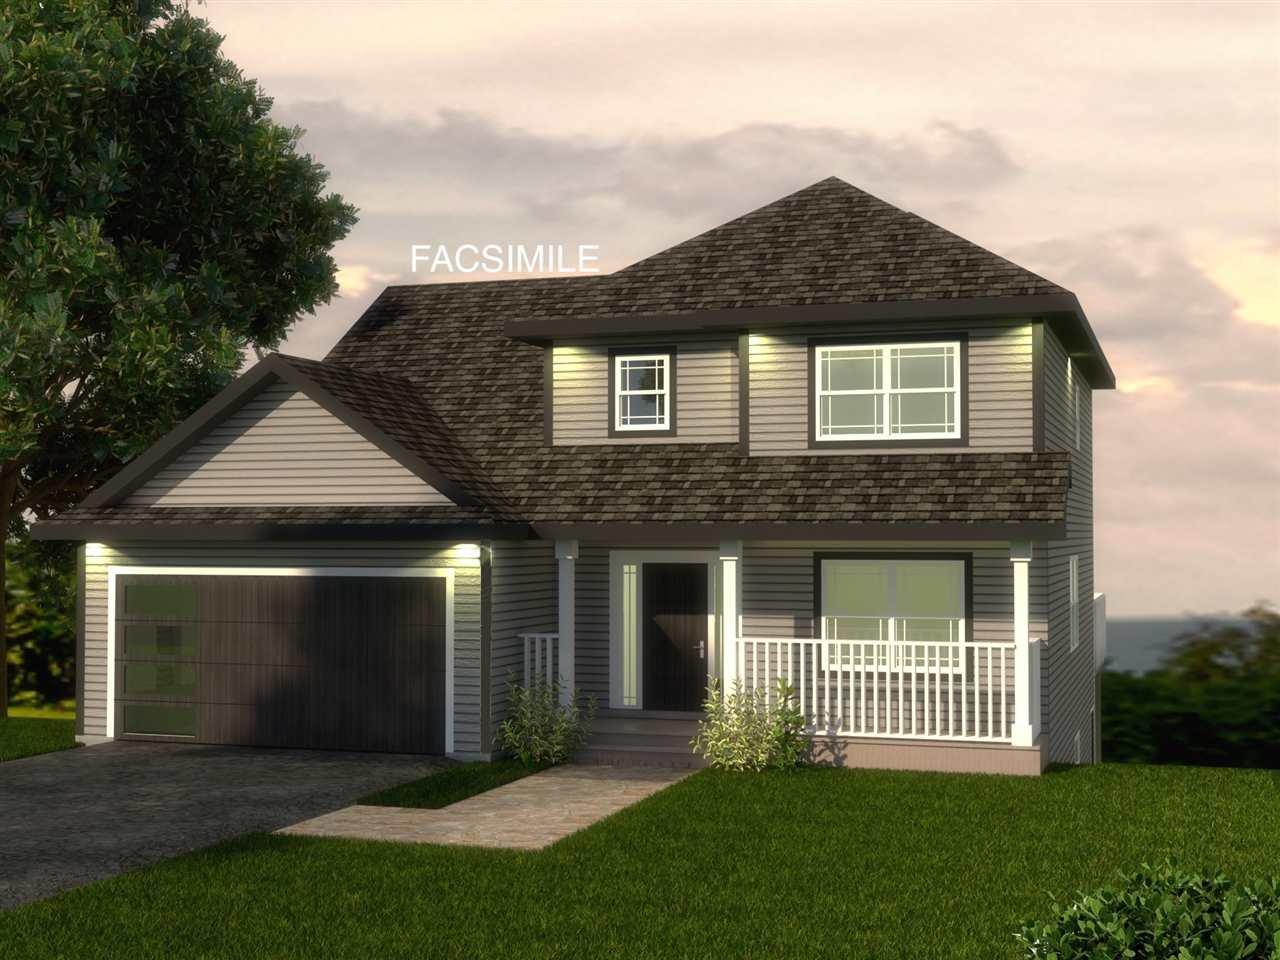 Main Photo: Lot 213 171 Sidhu Drive in Beaver Bank: 26-Beaverbank, Upper Sackville Residential for sale (Halifax-Dartmouth)  : MLS®# 202100288